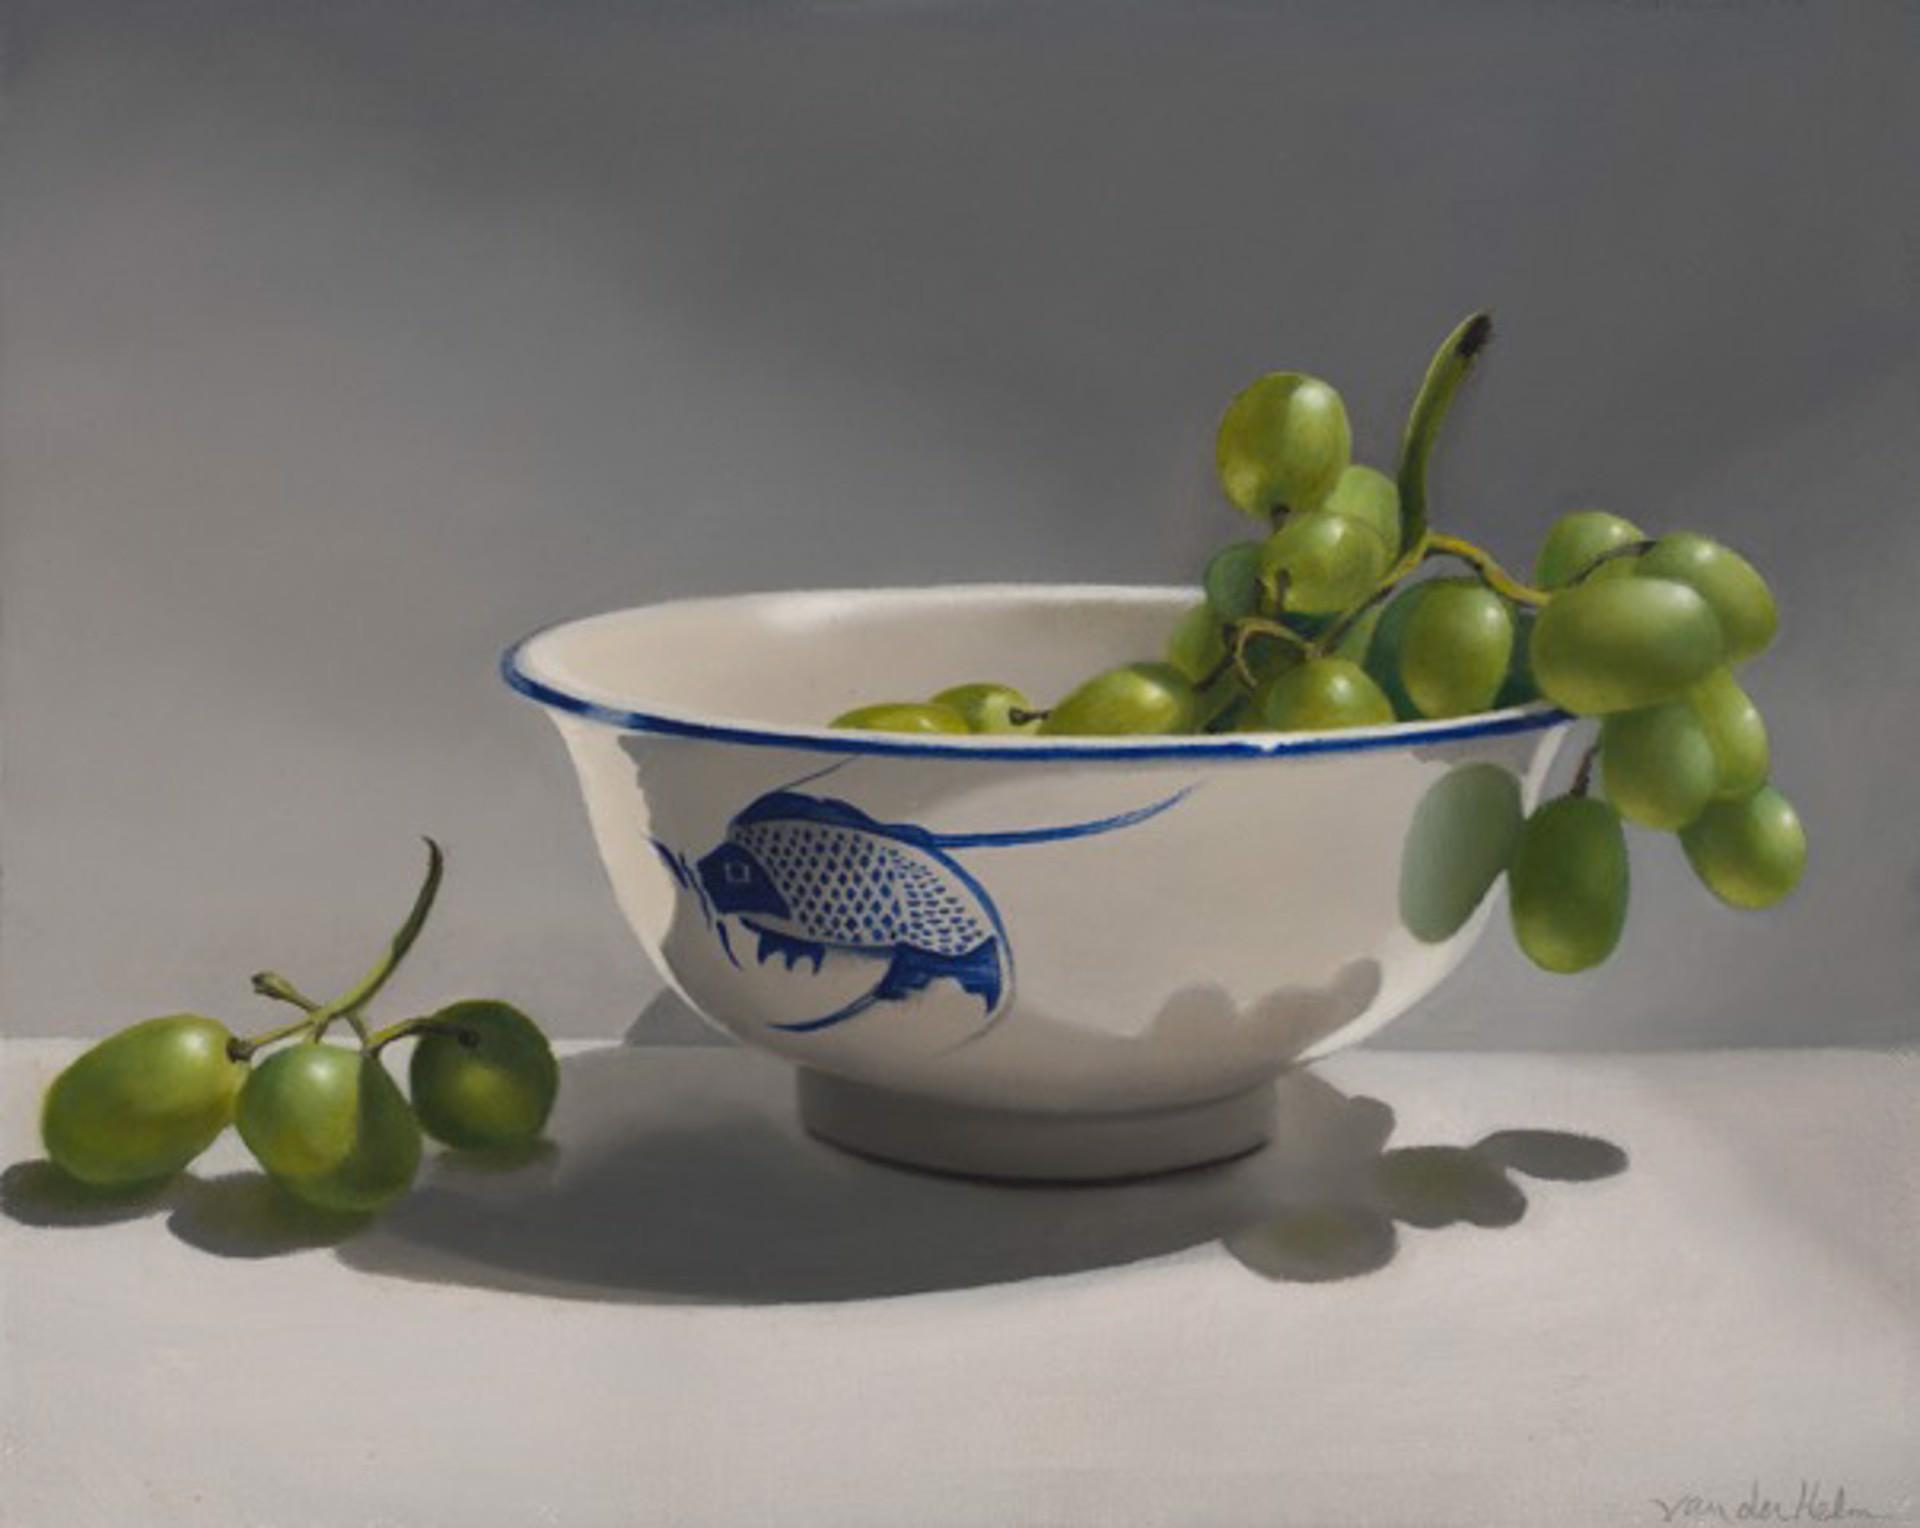 Bowl with Grapes by Sarah van der Helm